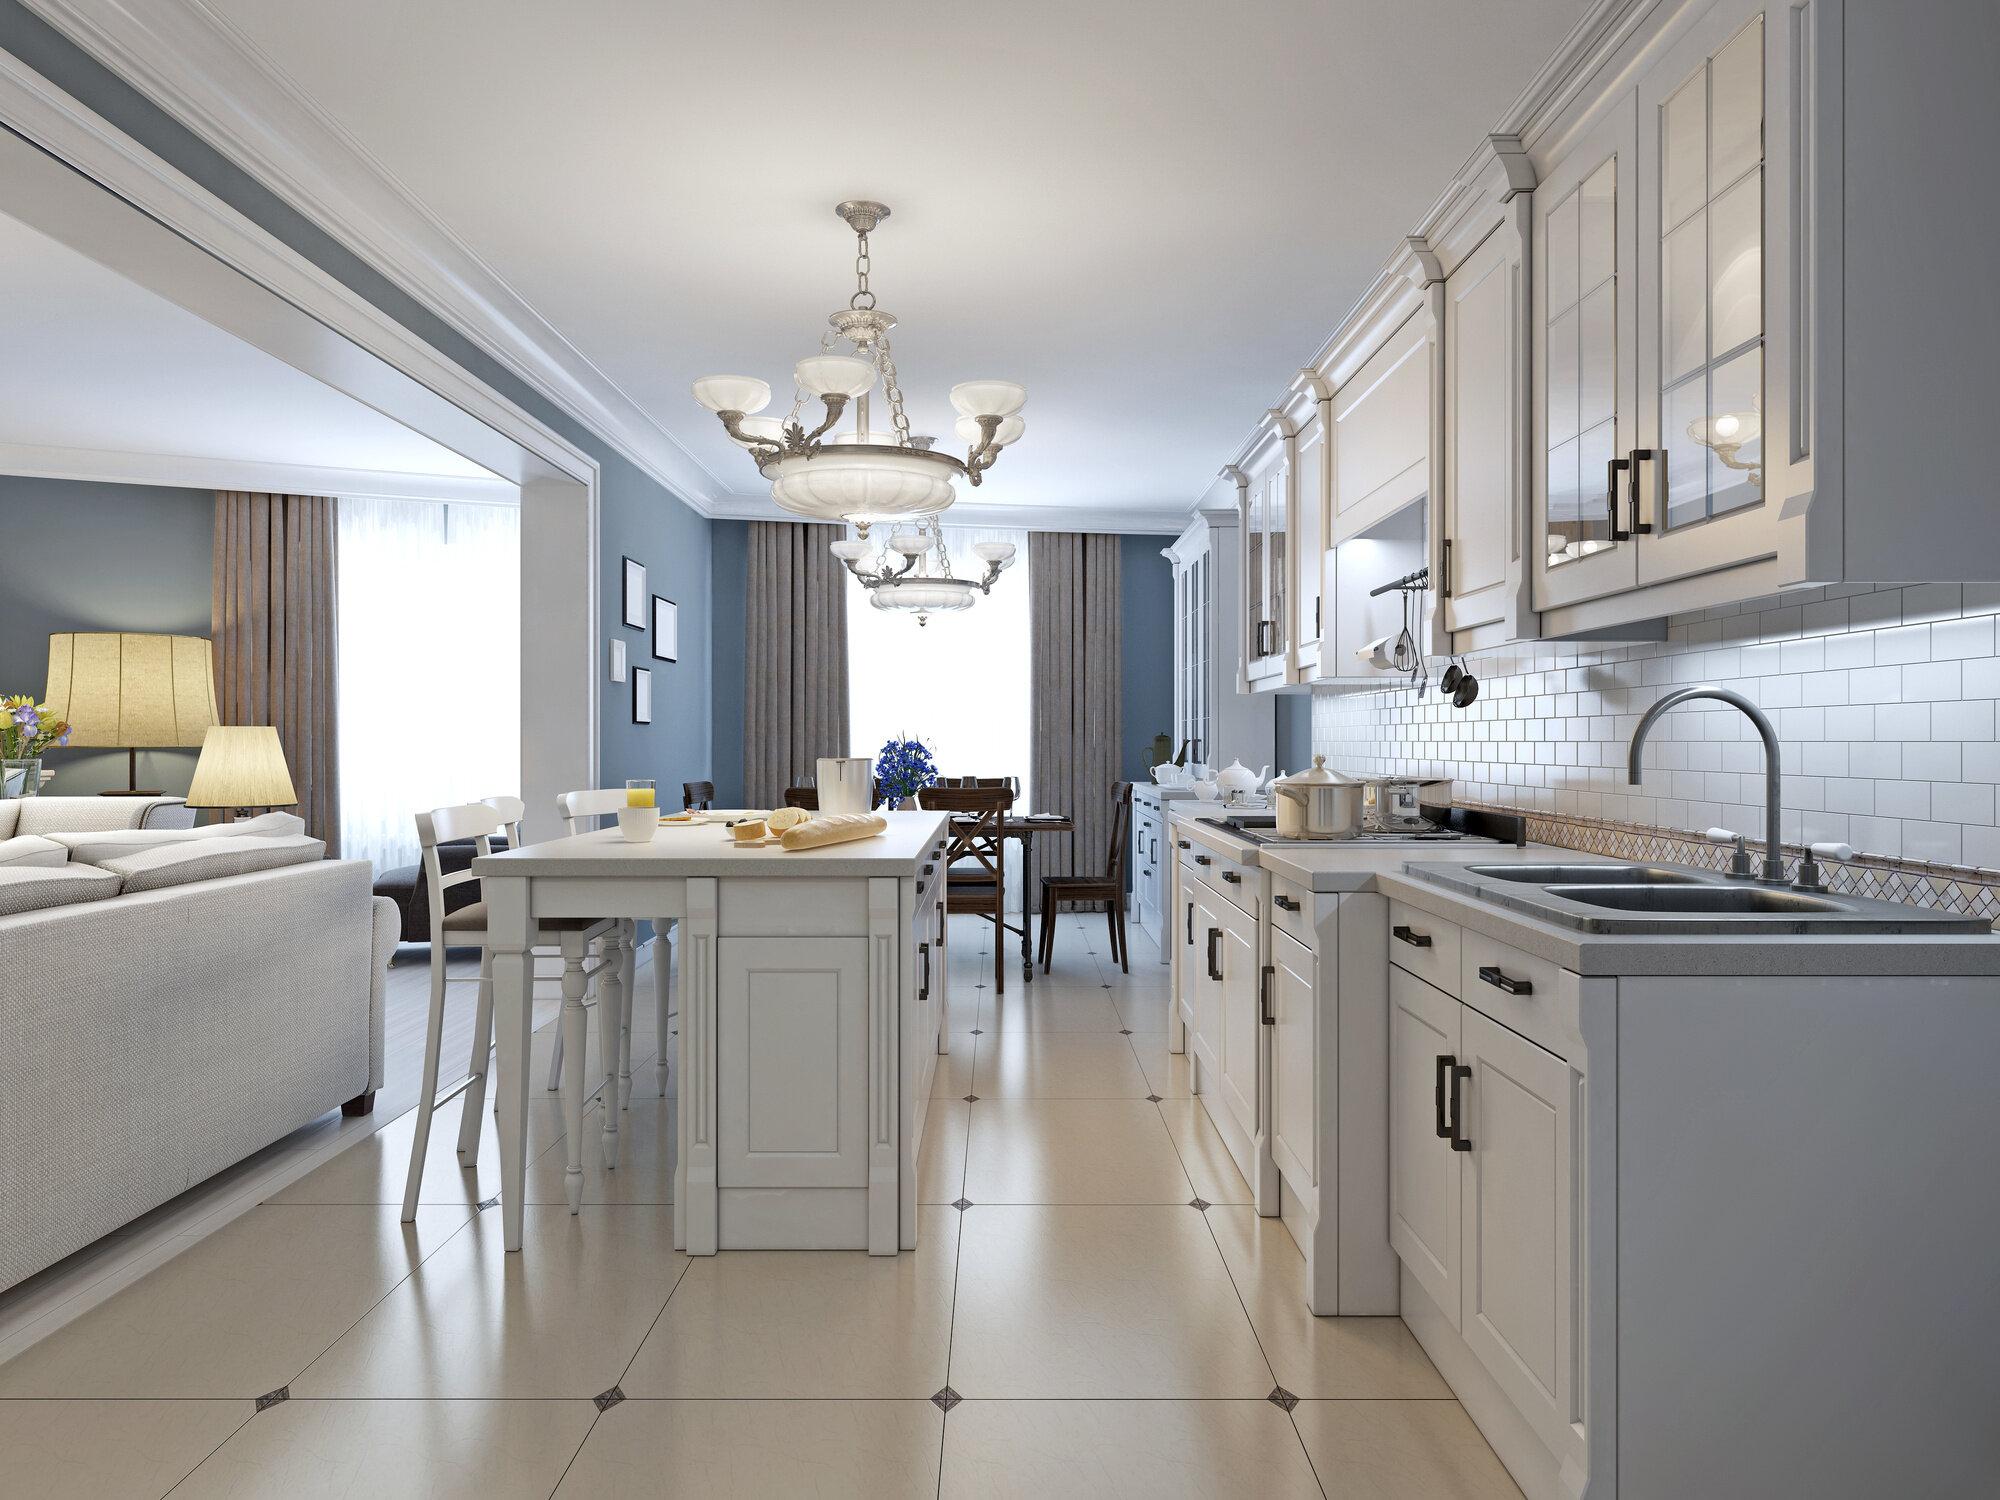 - 8 Backsplash Trends To Inspire Your Kitchen Remodel